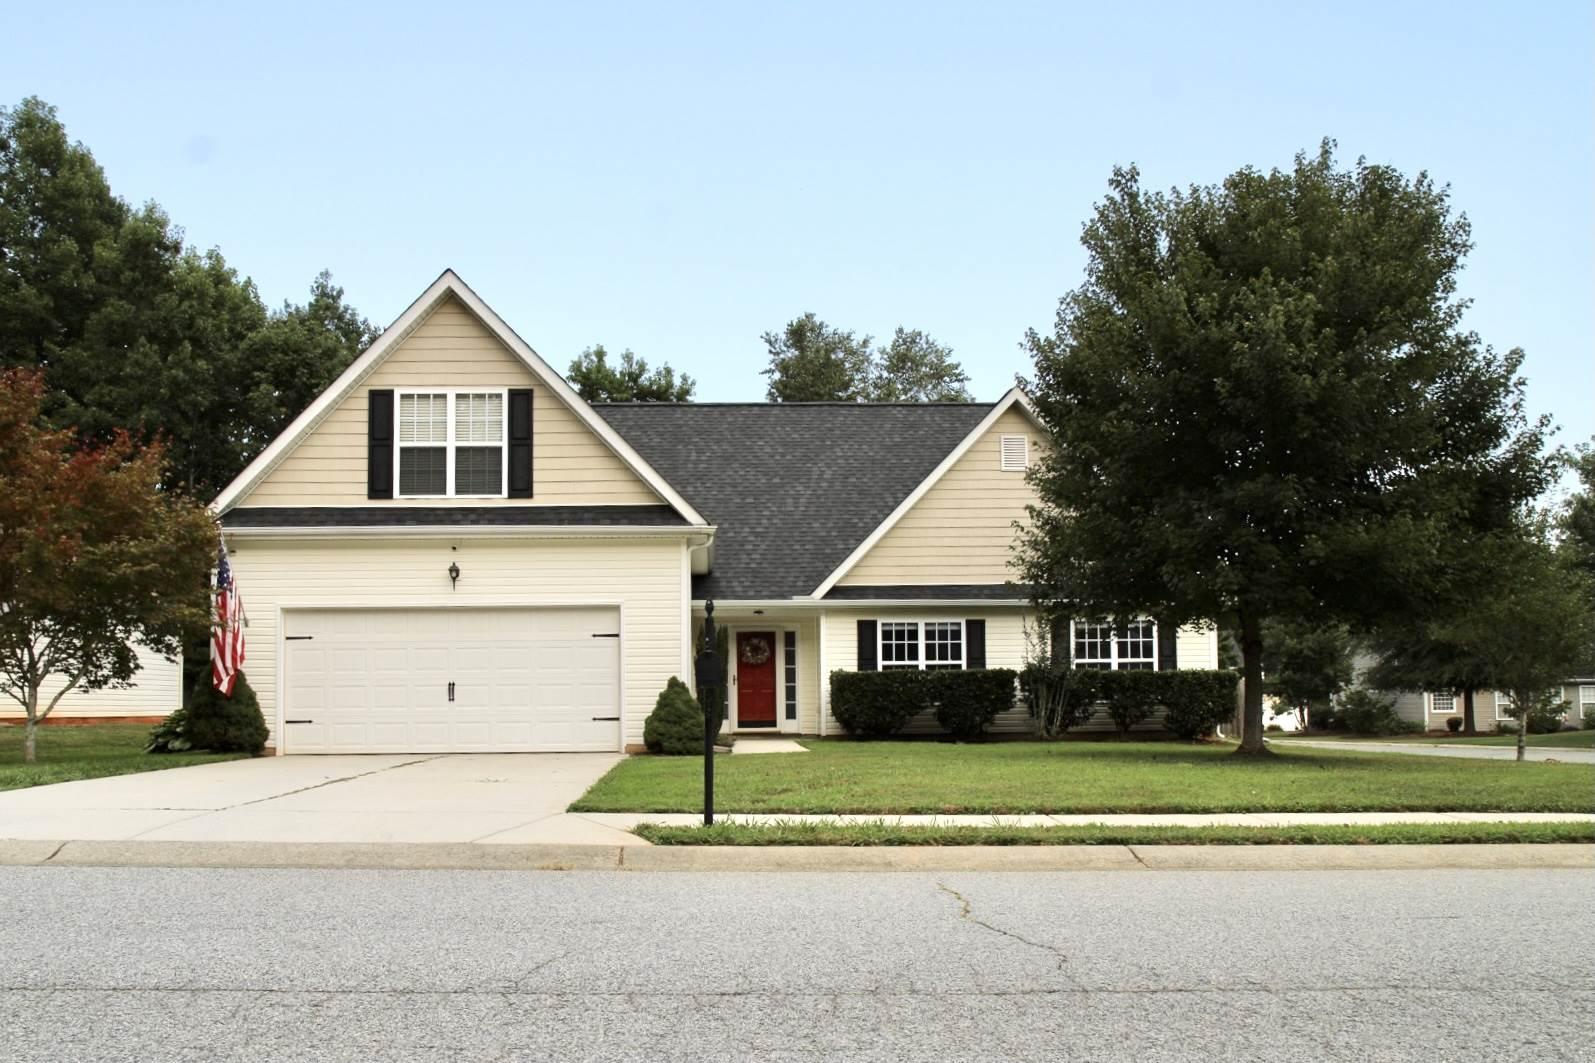 617 Hawthorn Ridge Drive, Whitesett, NC 27377